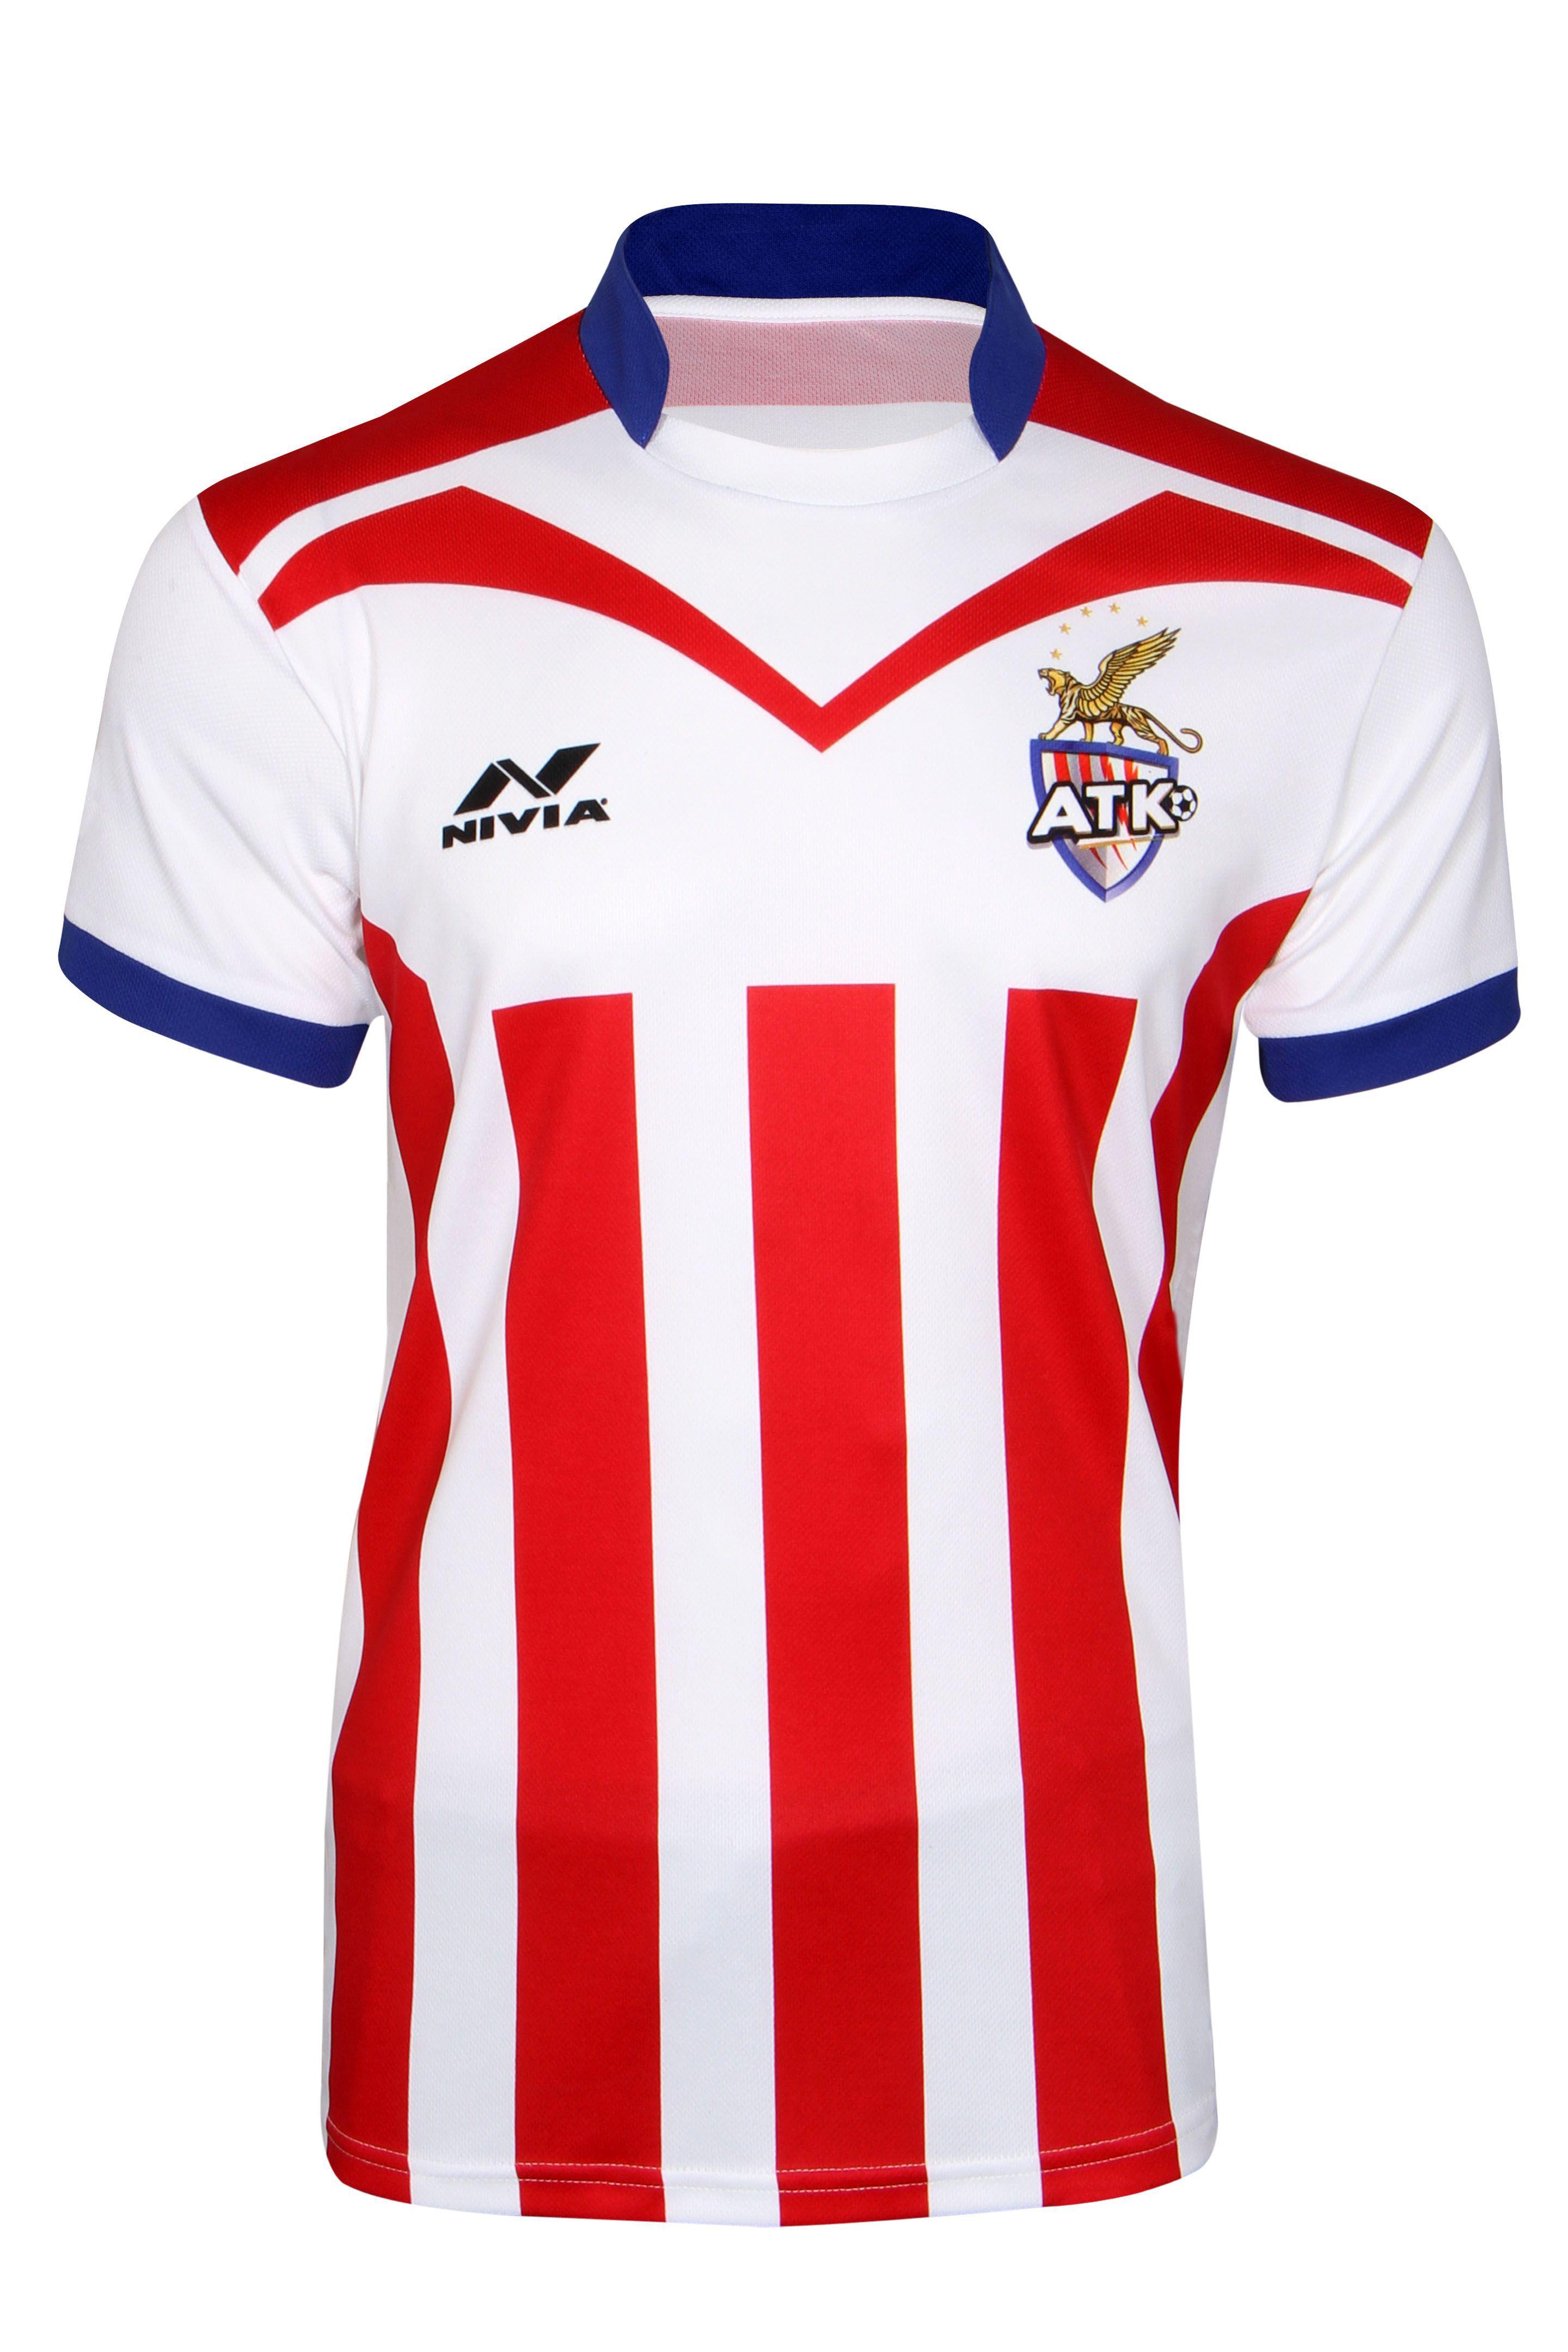 Nivia Atletico De Kolkata Team Jersey-N-PK-PP-J-S